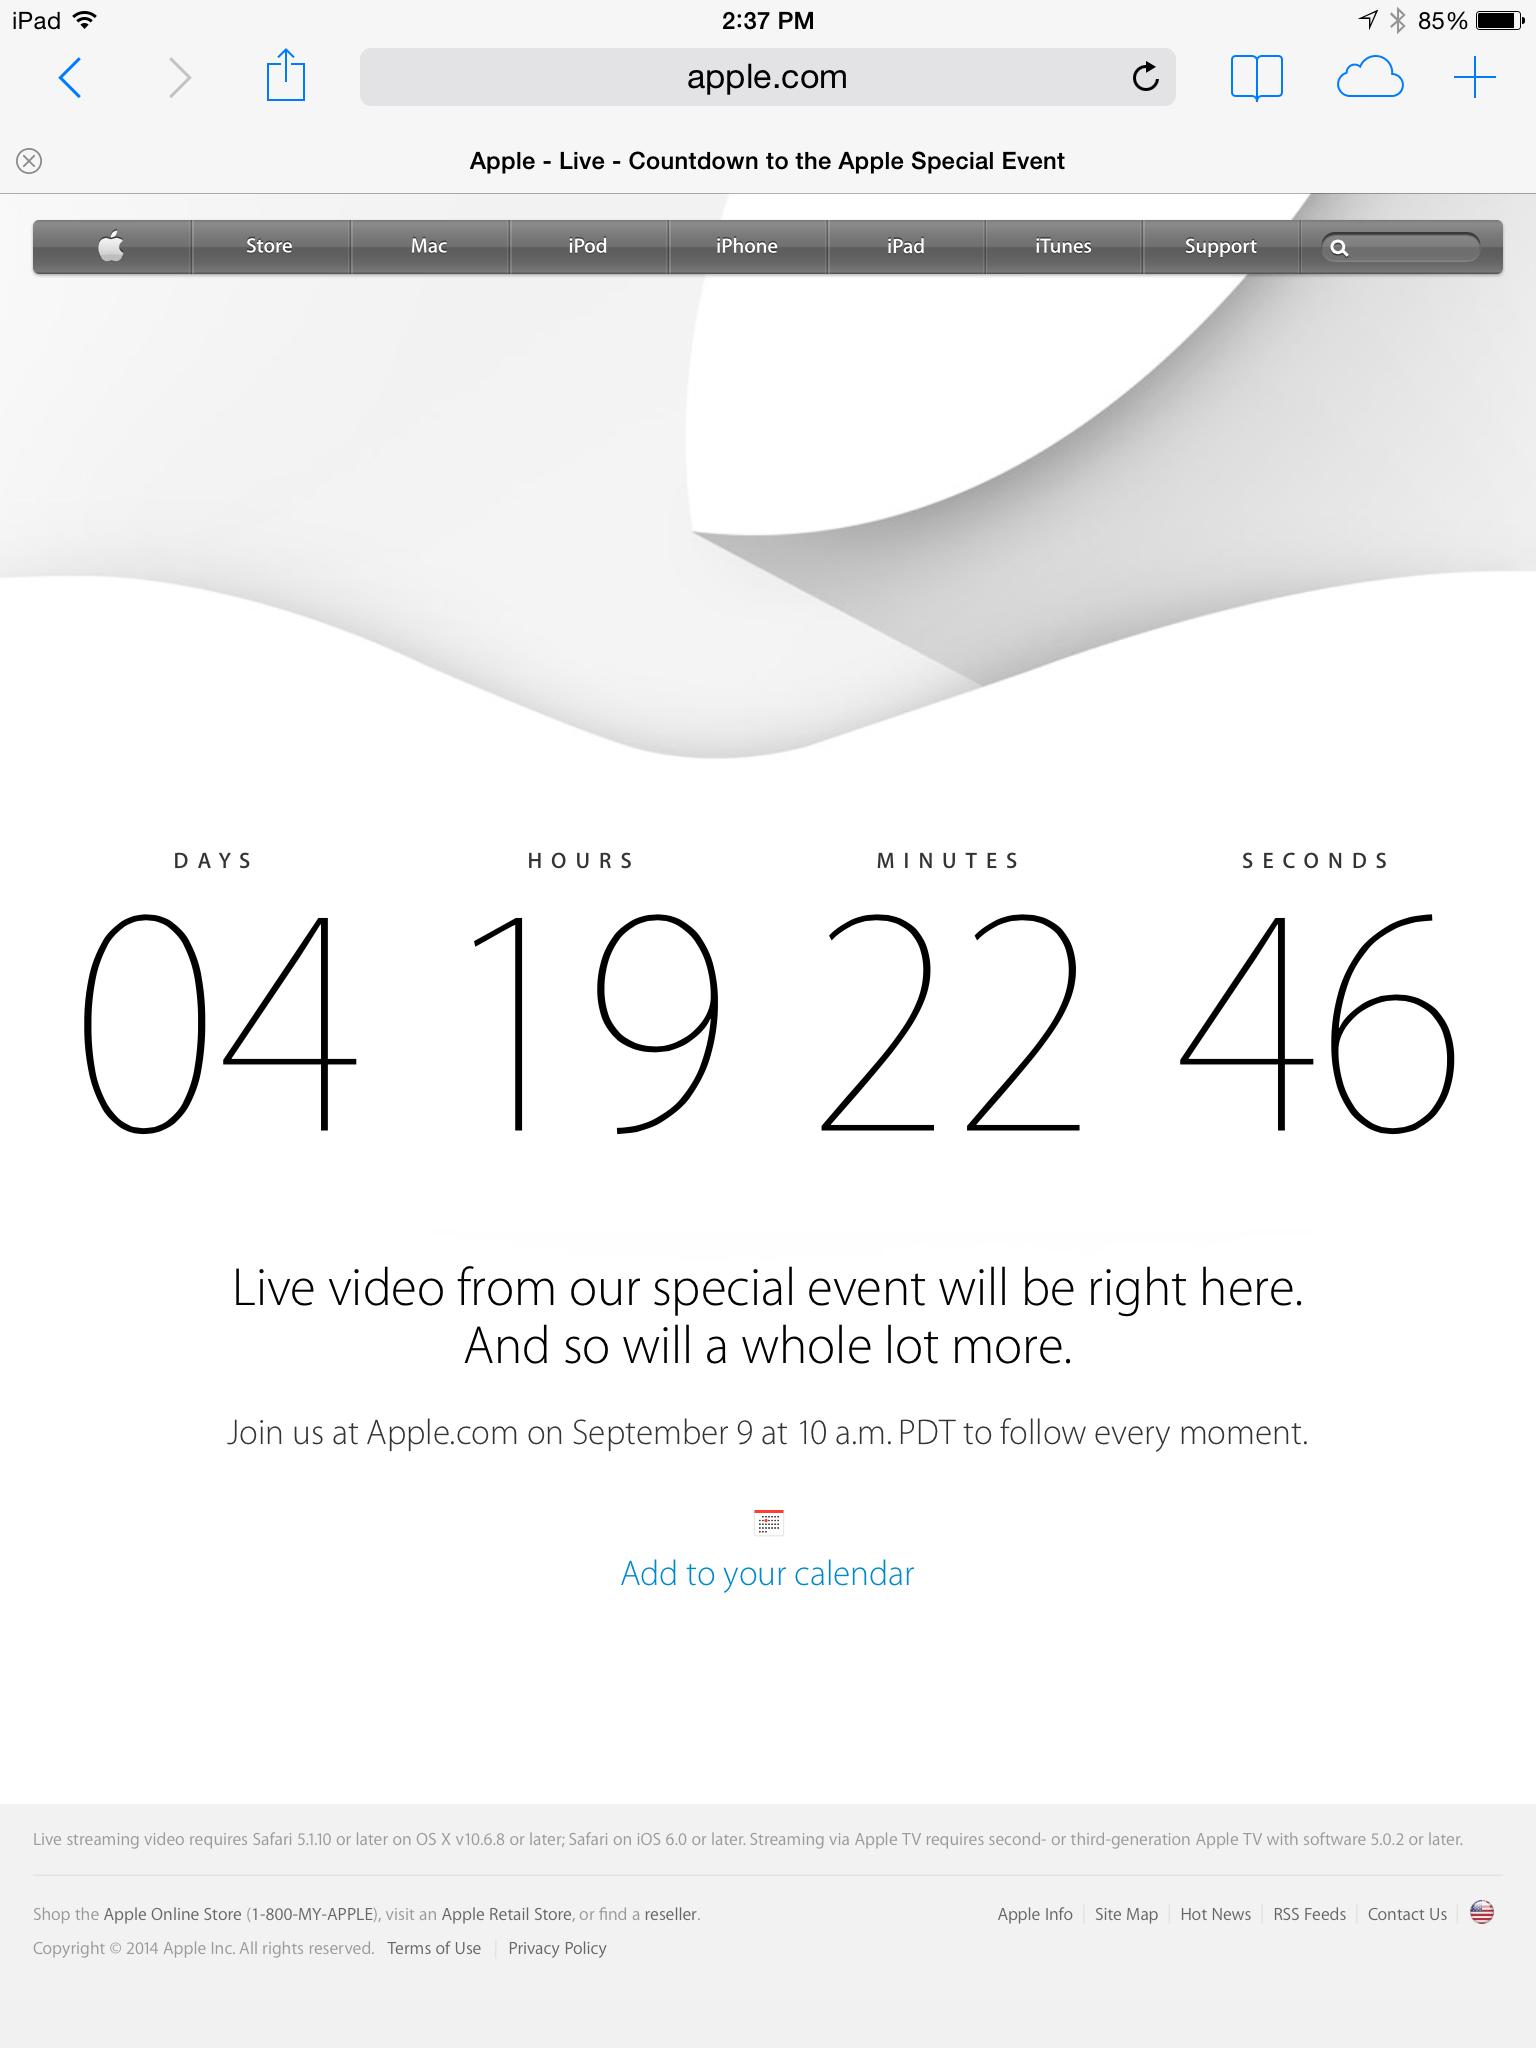 www.apple.com/live